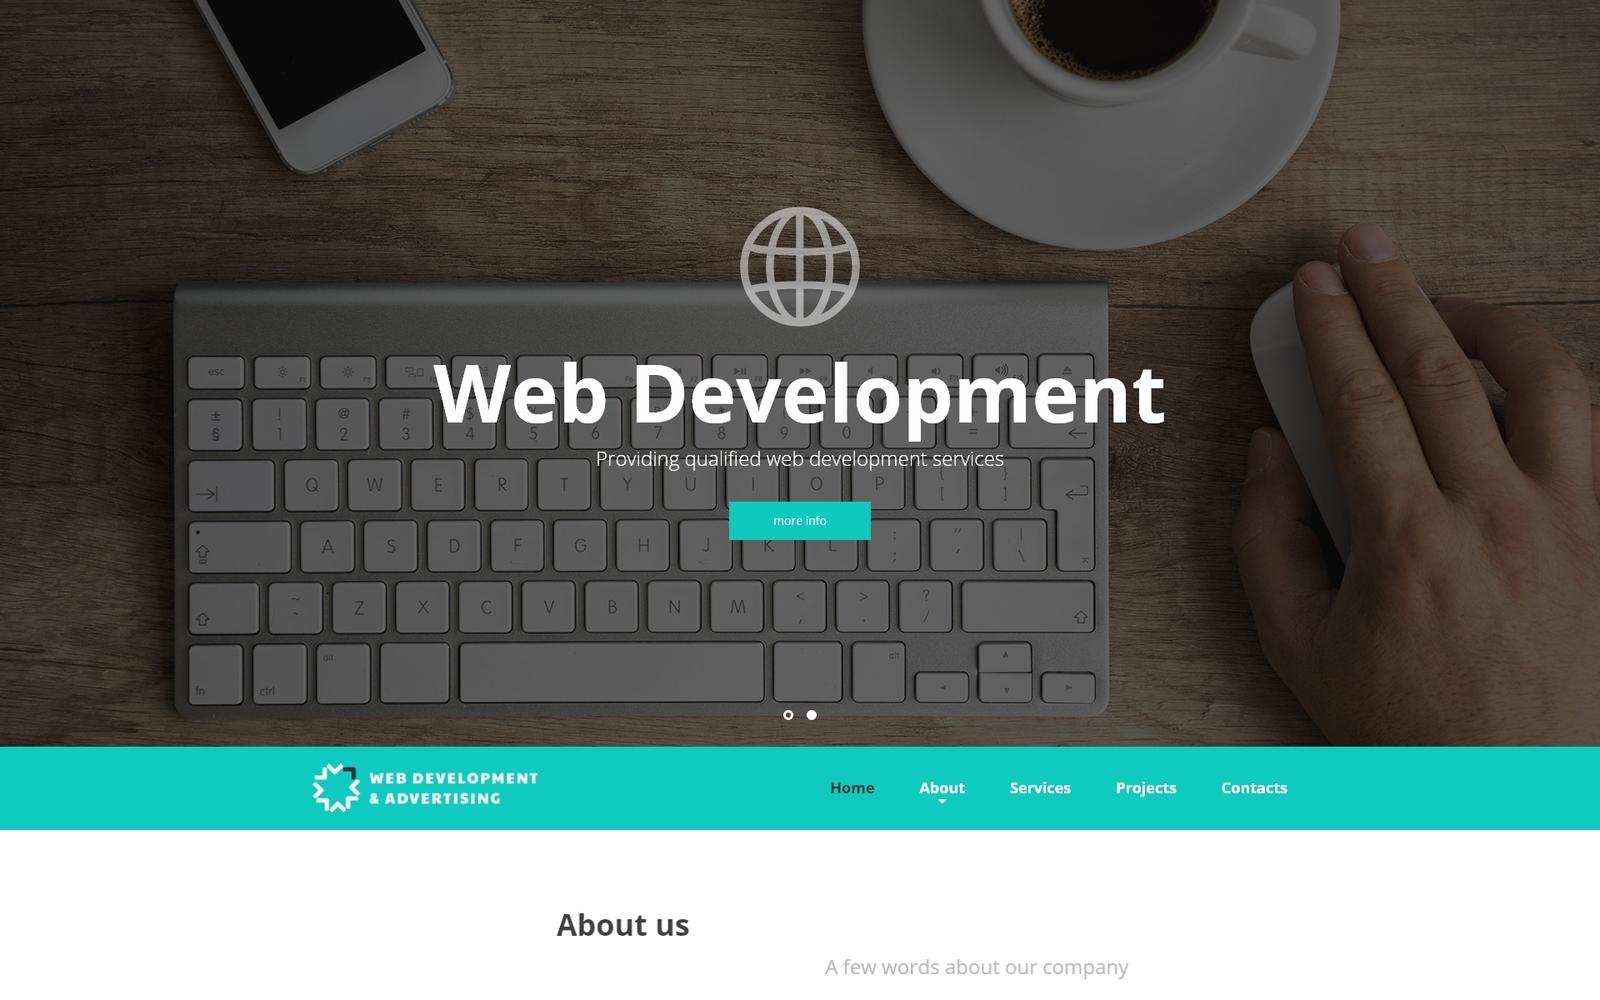 """Web Development & Advertising - Web Development Responsive"" Responsive Website template №52537"